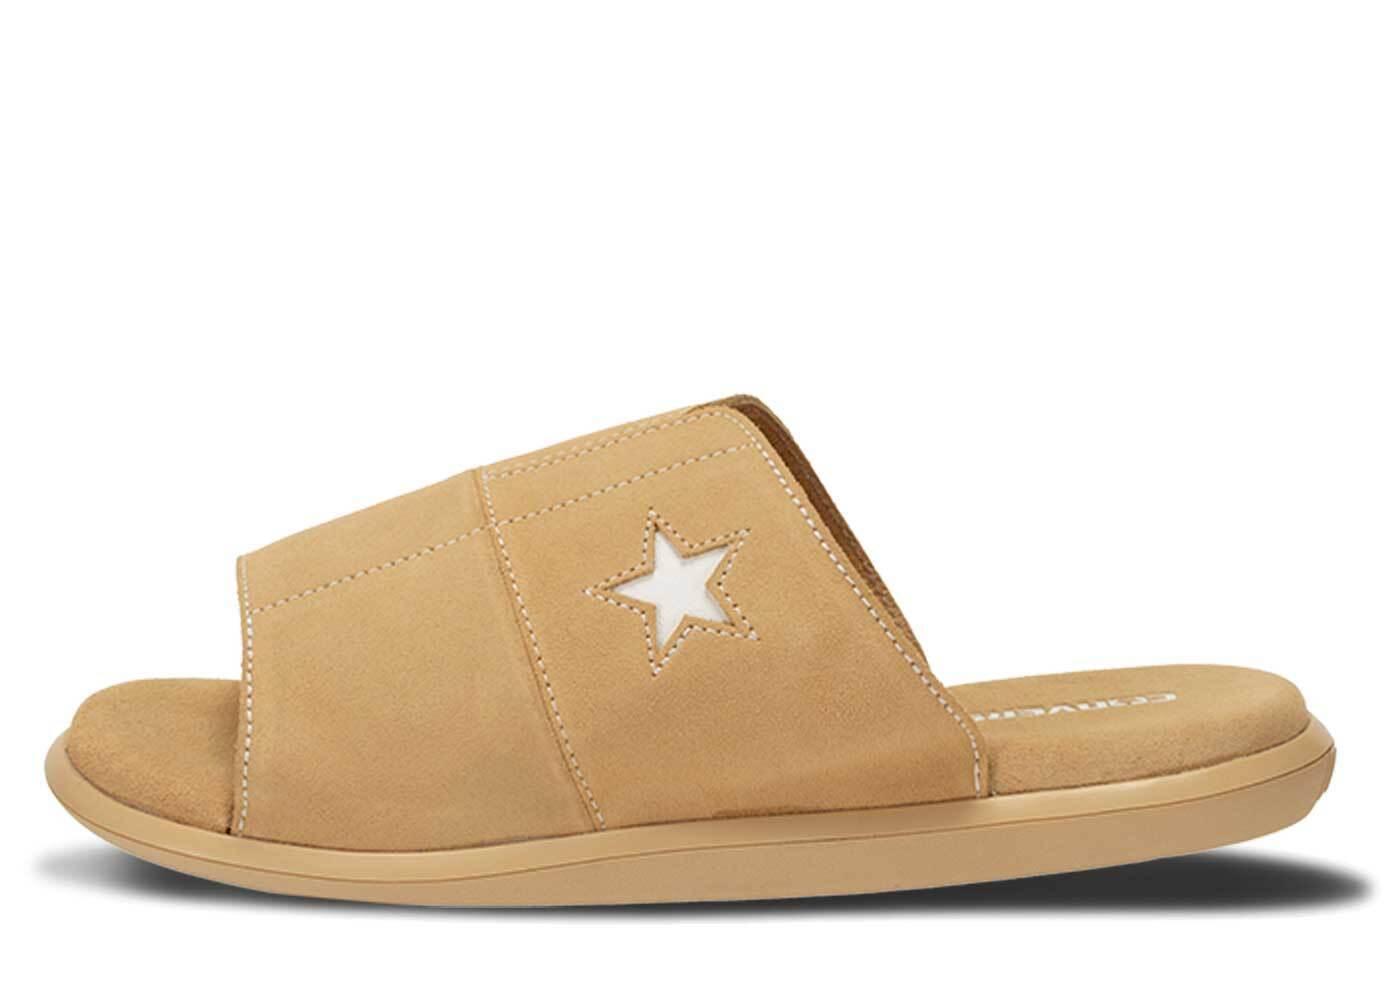 Converse Addict One Star Sandal Sand (2021)の写真